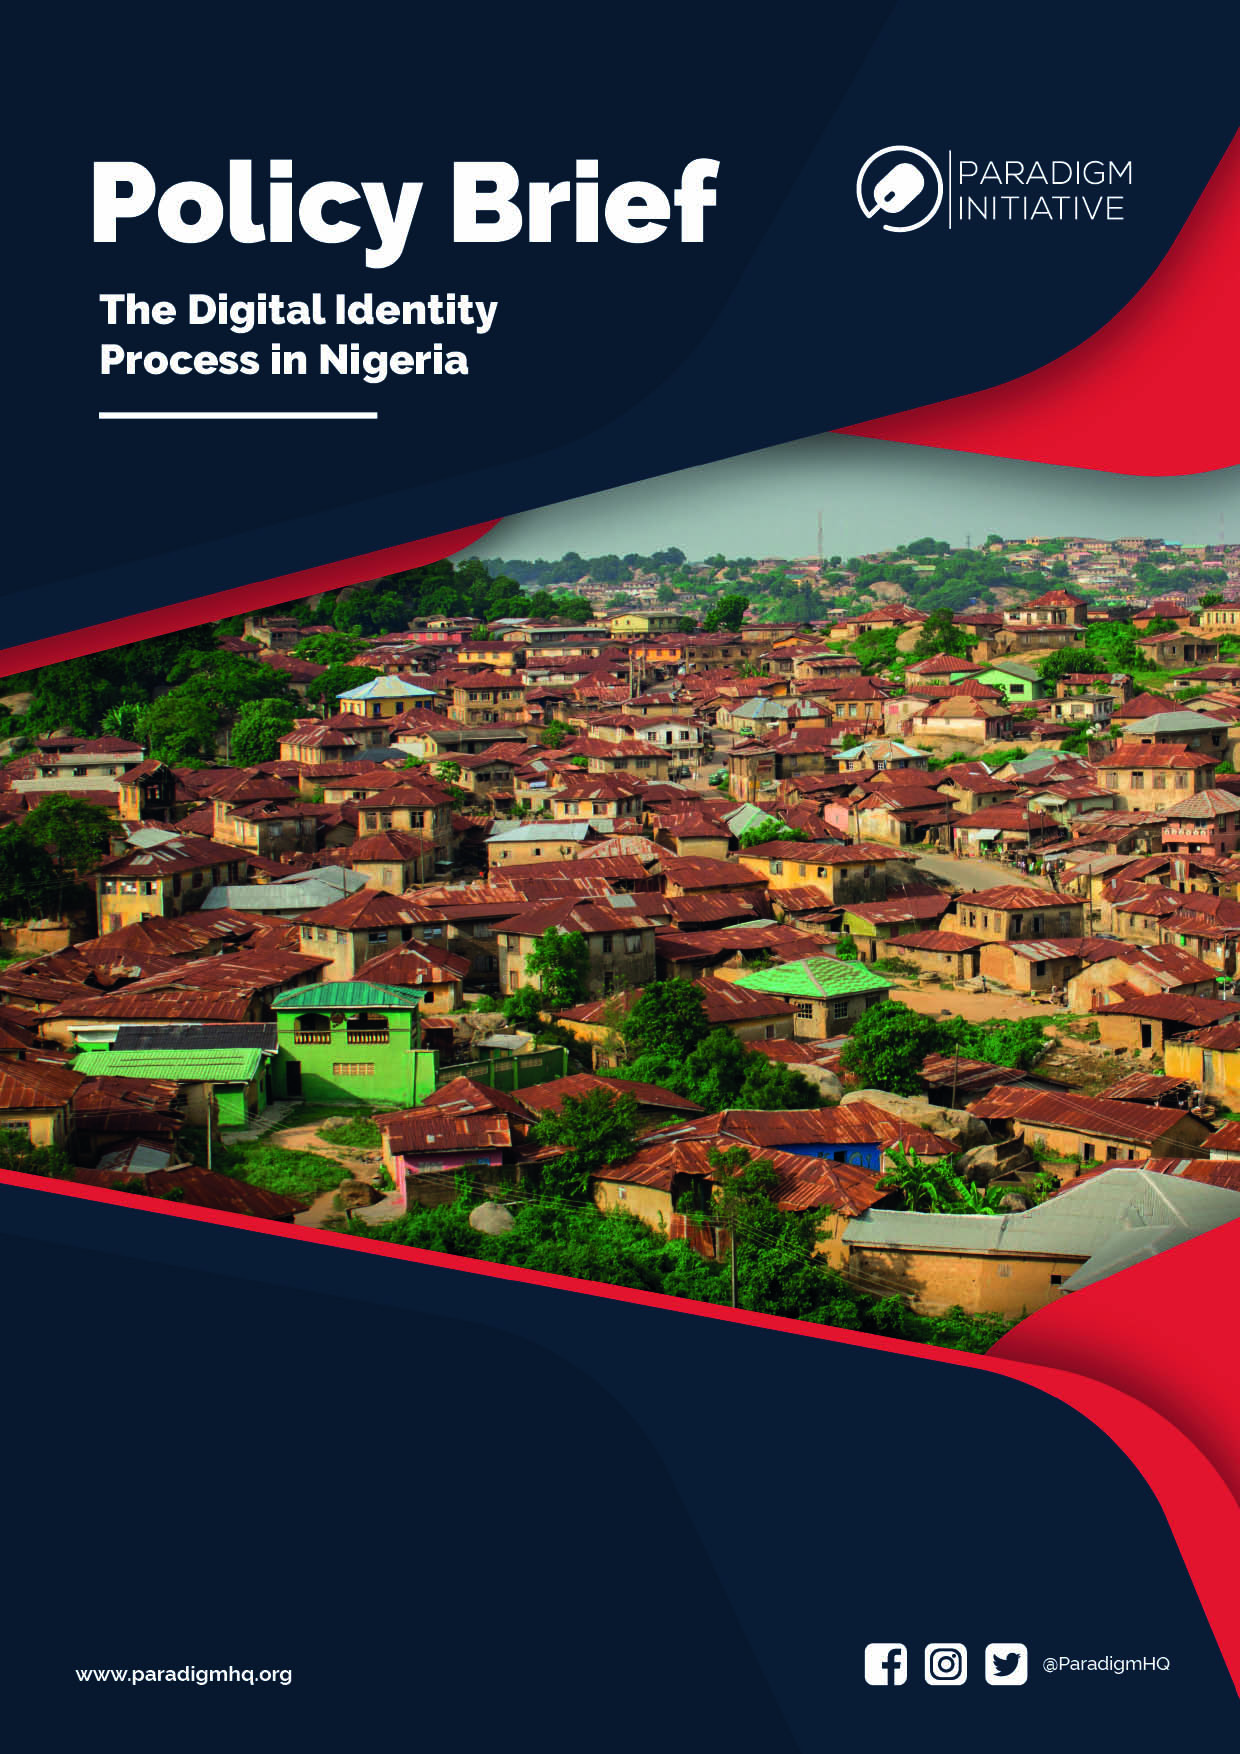 Policy Brief: The Digital Identity Process in Nigeria